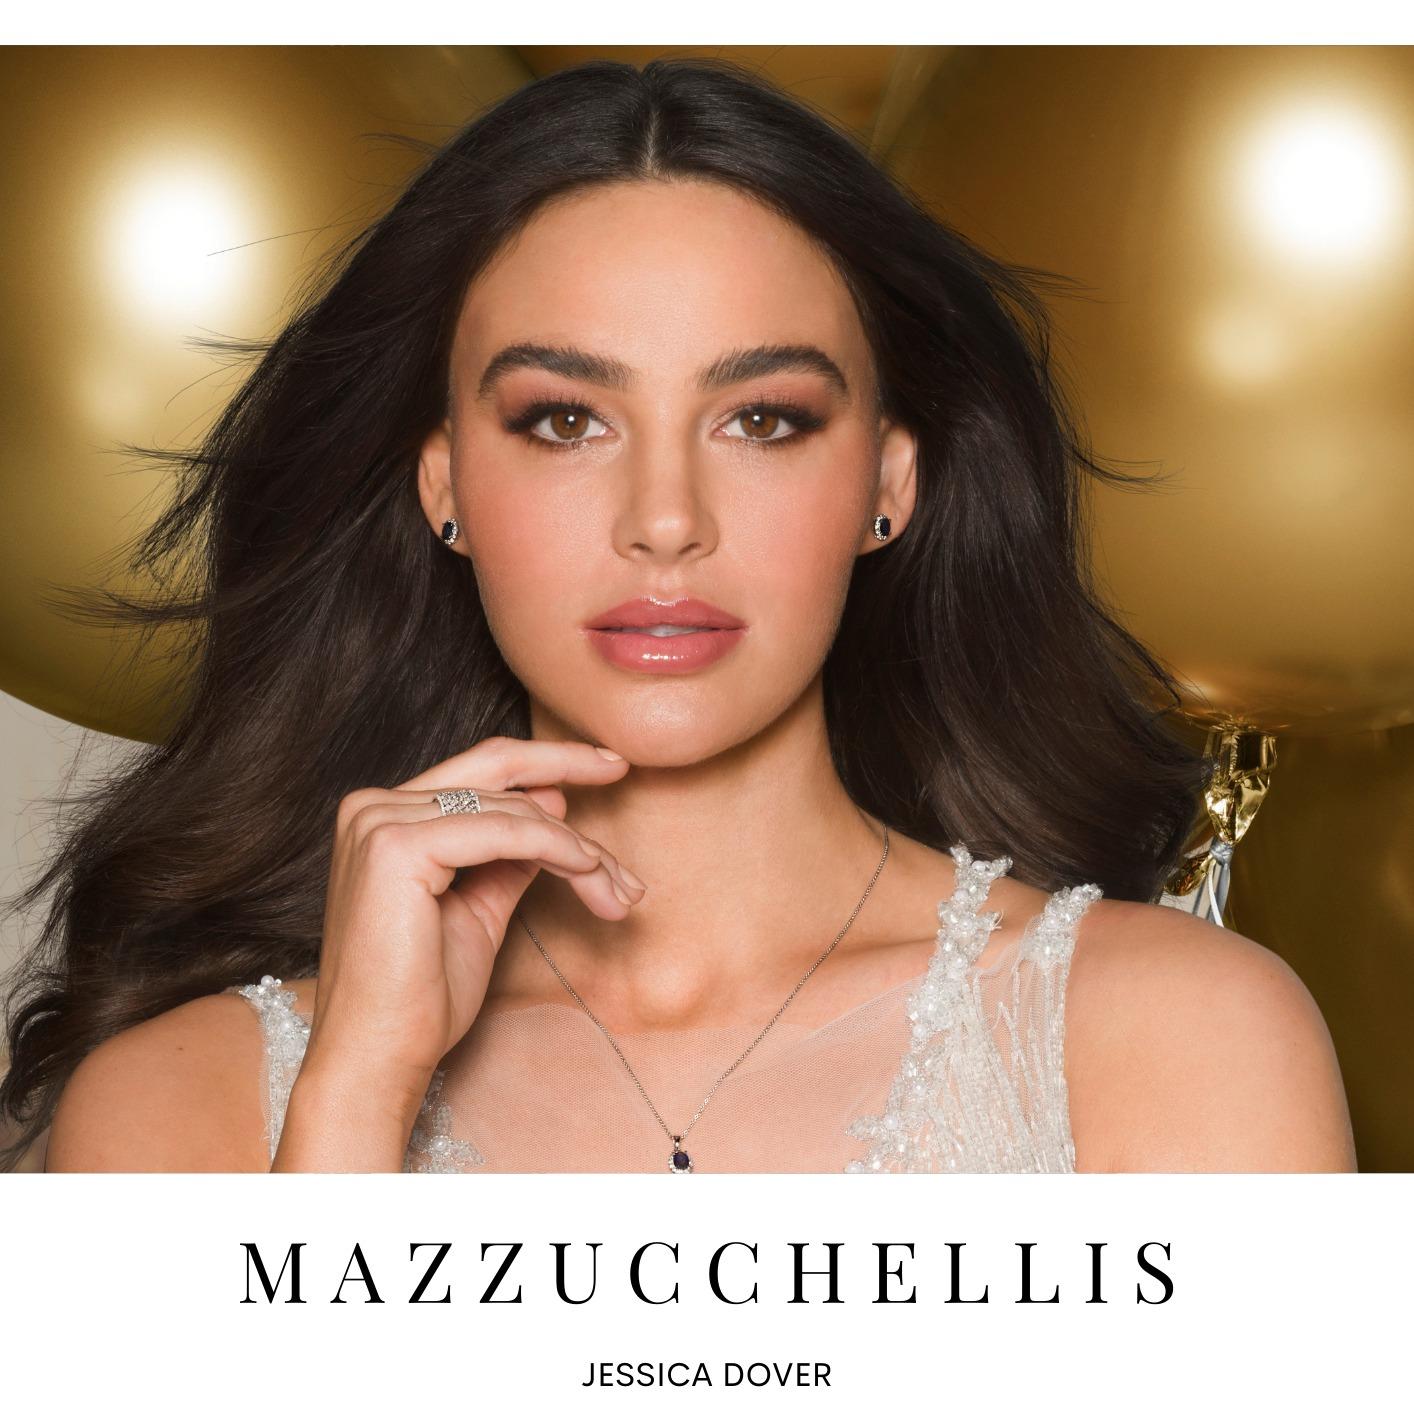 JESSICA DOVER FOR MAZZUCCHELLI'S 118TH ANNIVERSARY CAMPAIGN | The Models blog